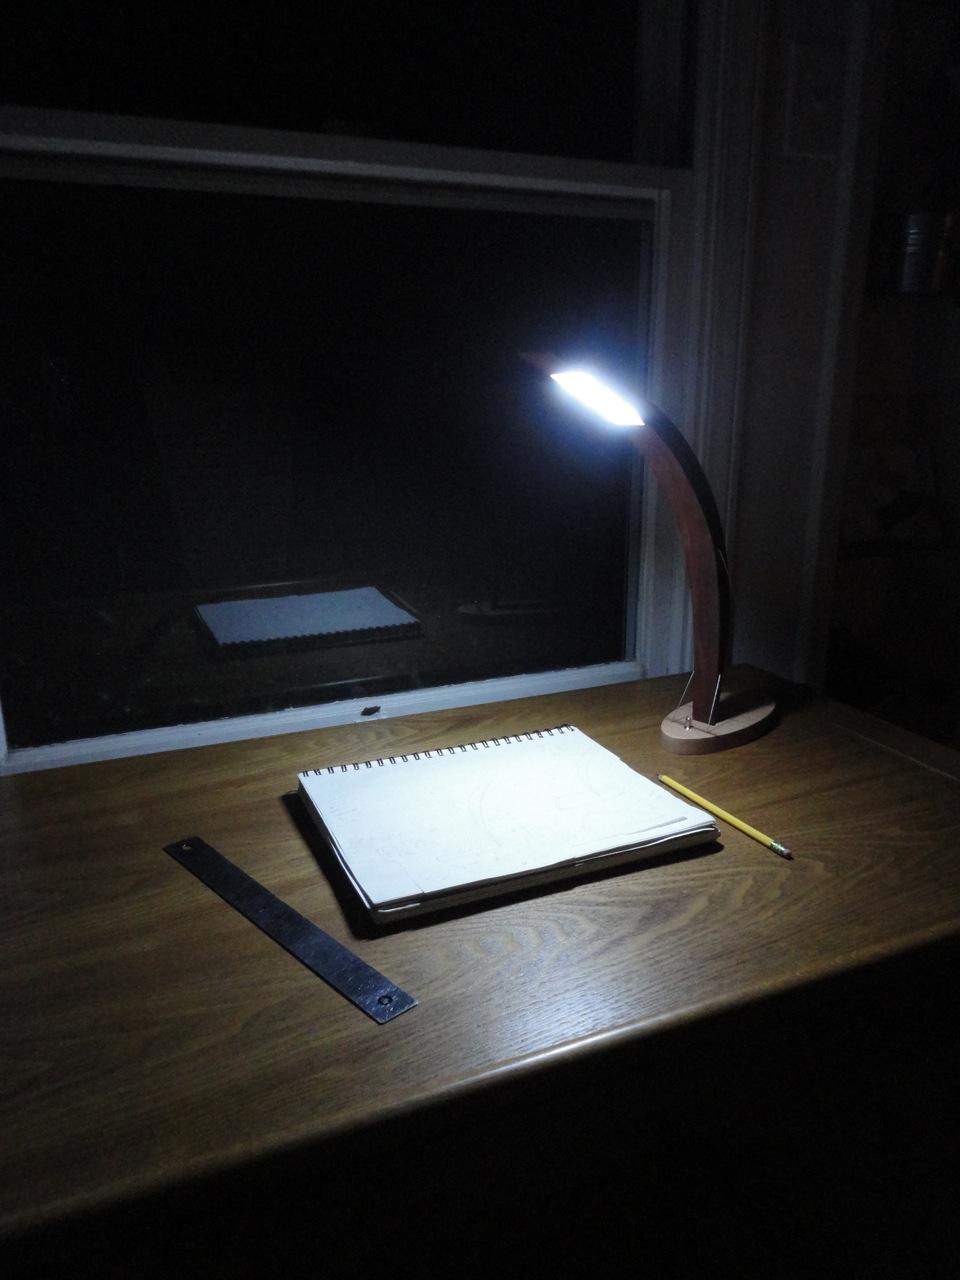 Brightness test... The lamp provides a lot of light!